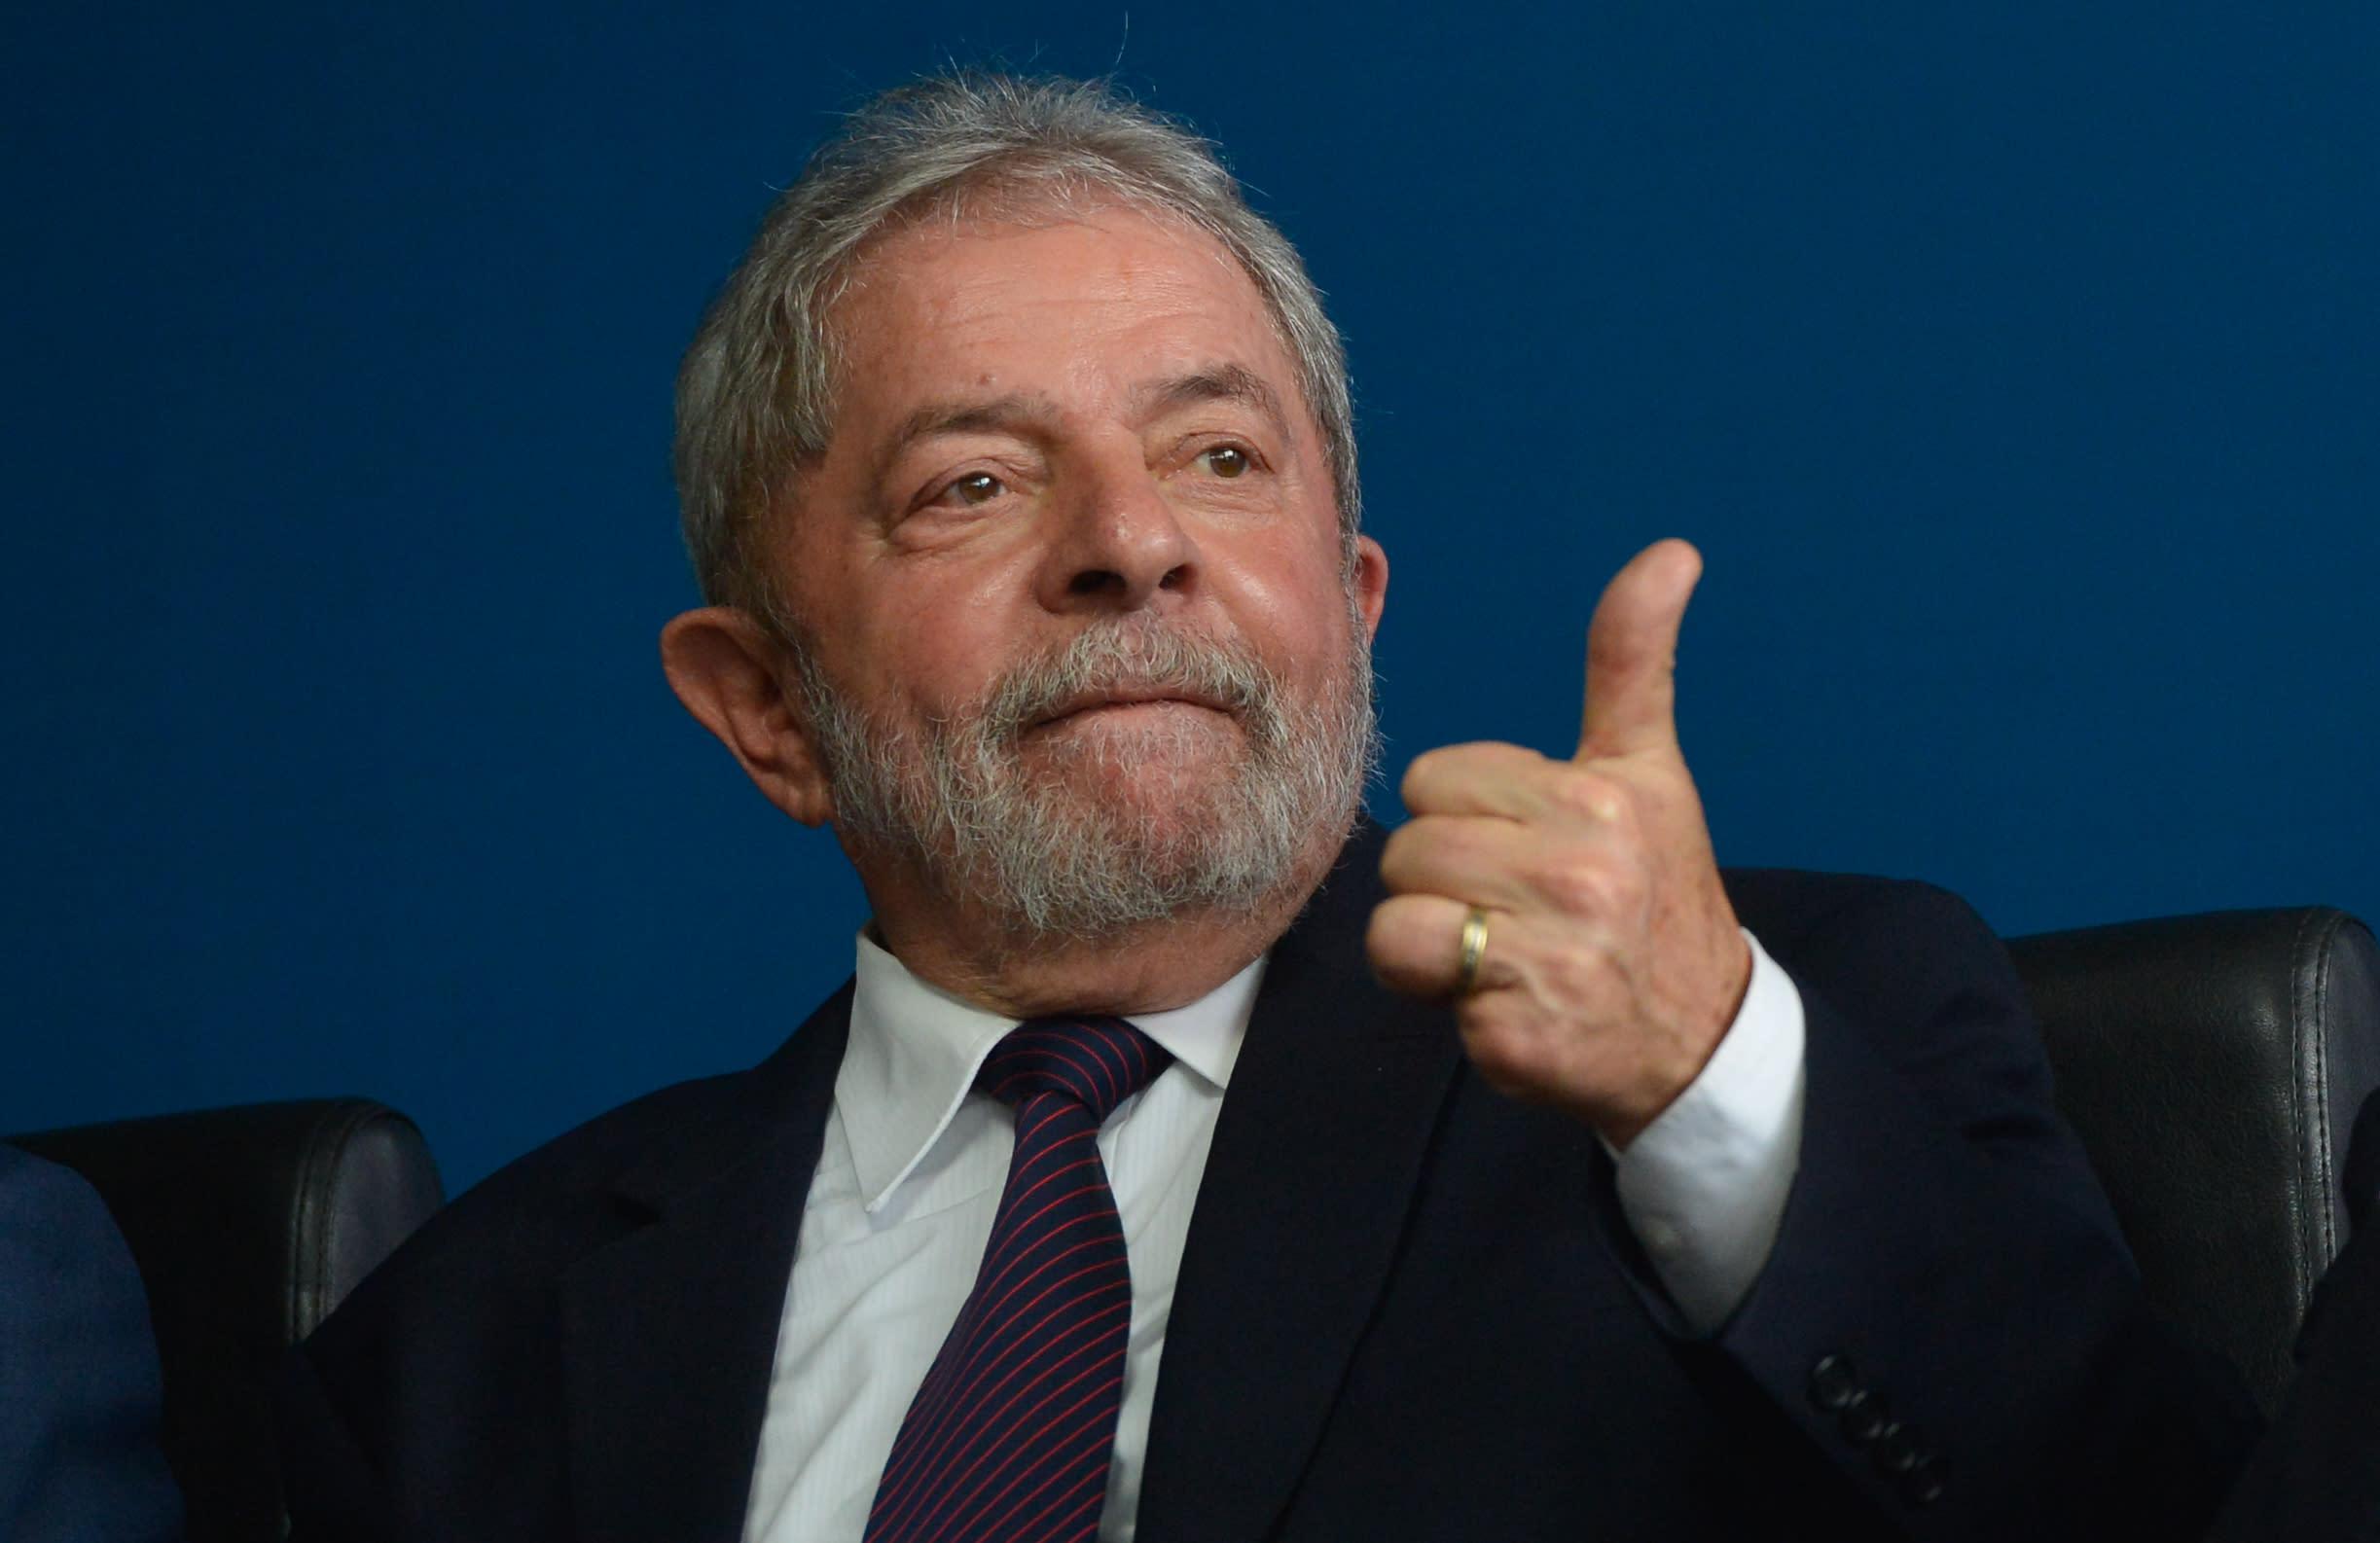 Justiça autoriza Lula a deixar cadeia após 580 dias